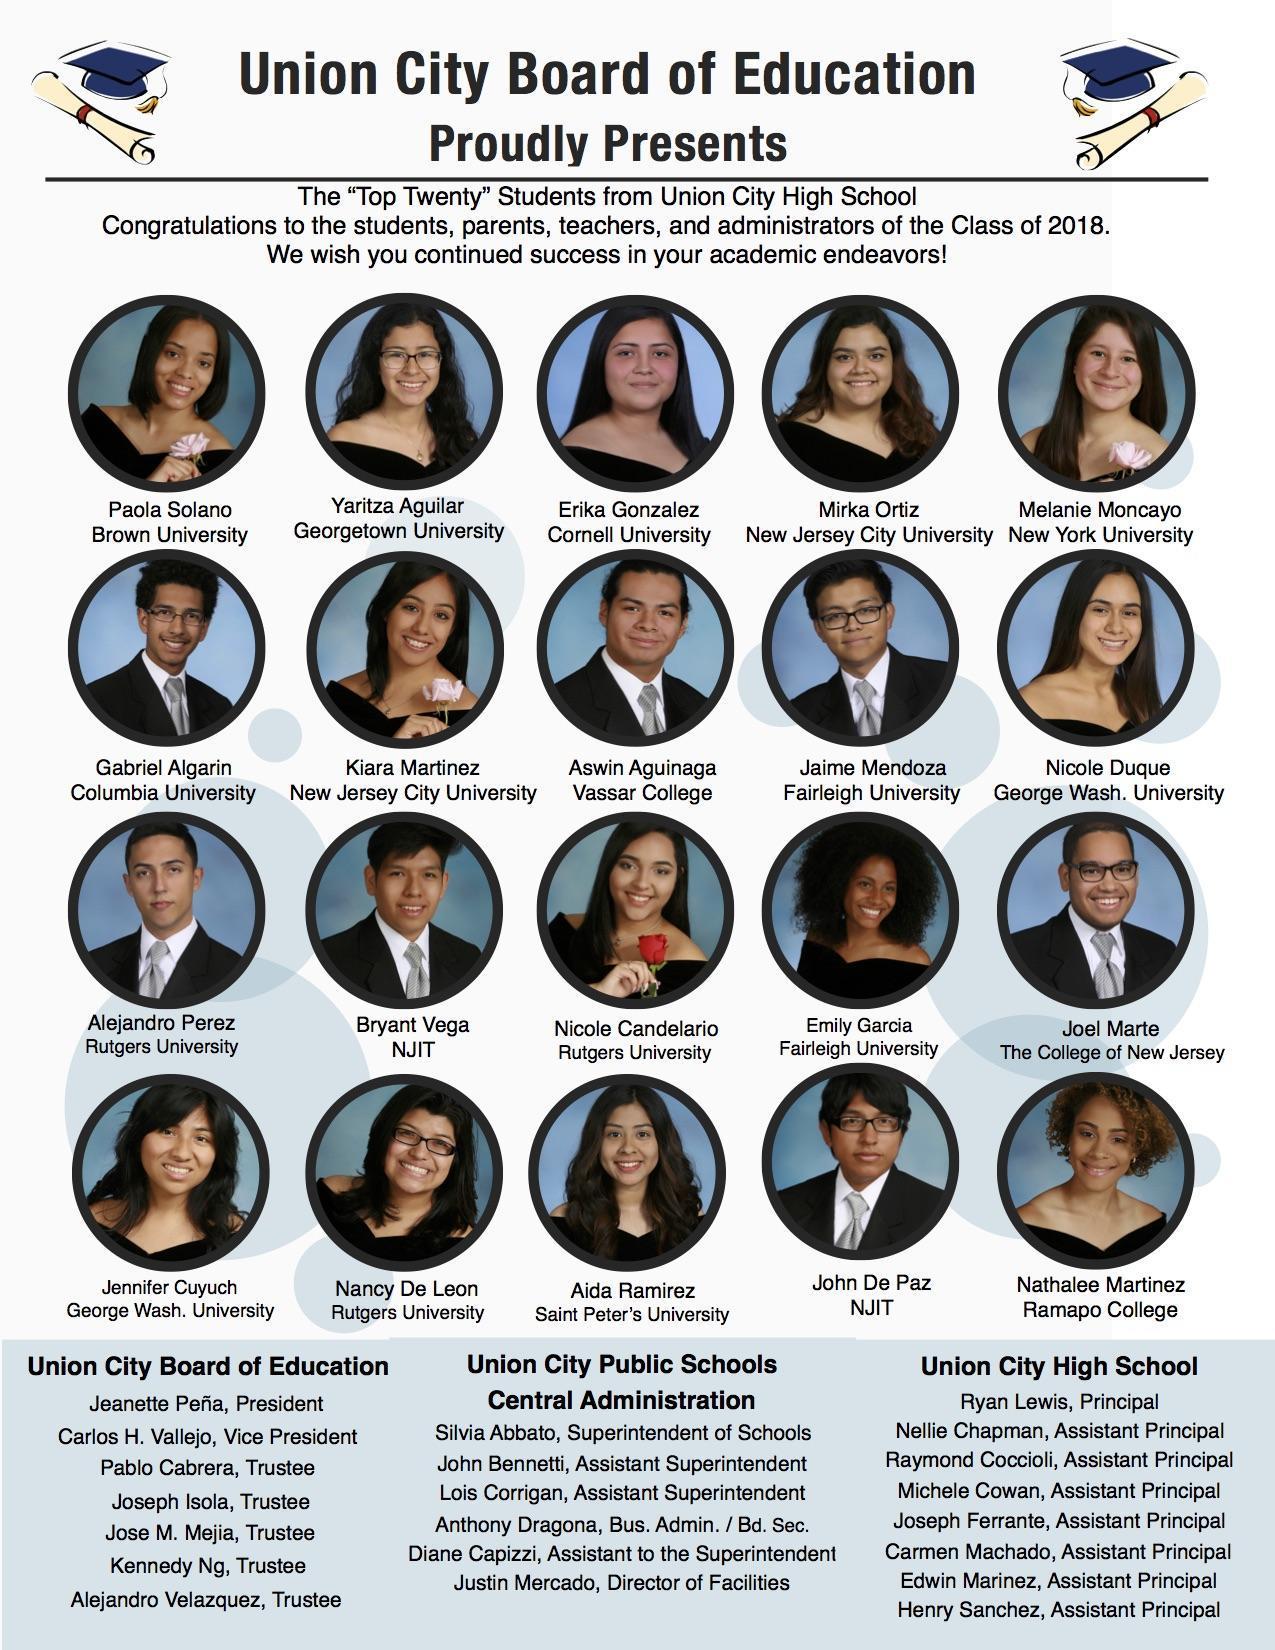 UCHS Class of 2018 Top 20